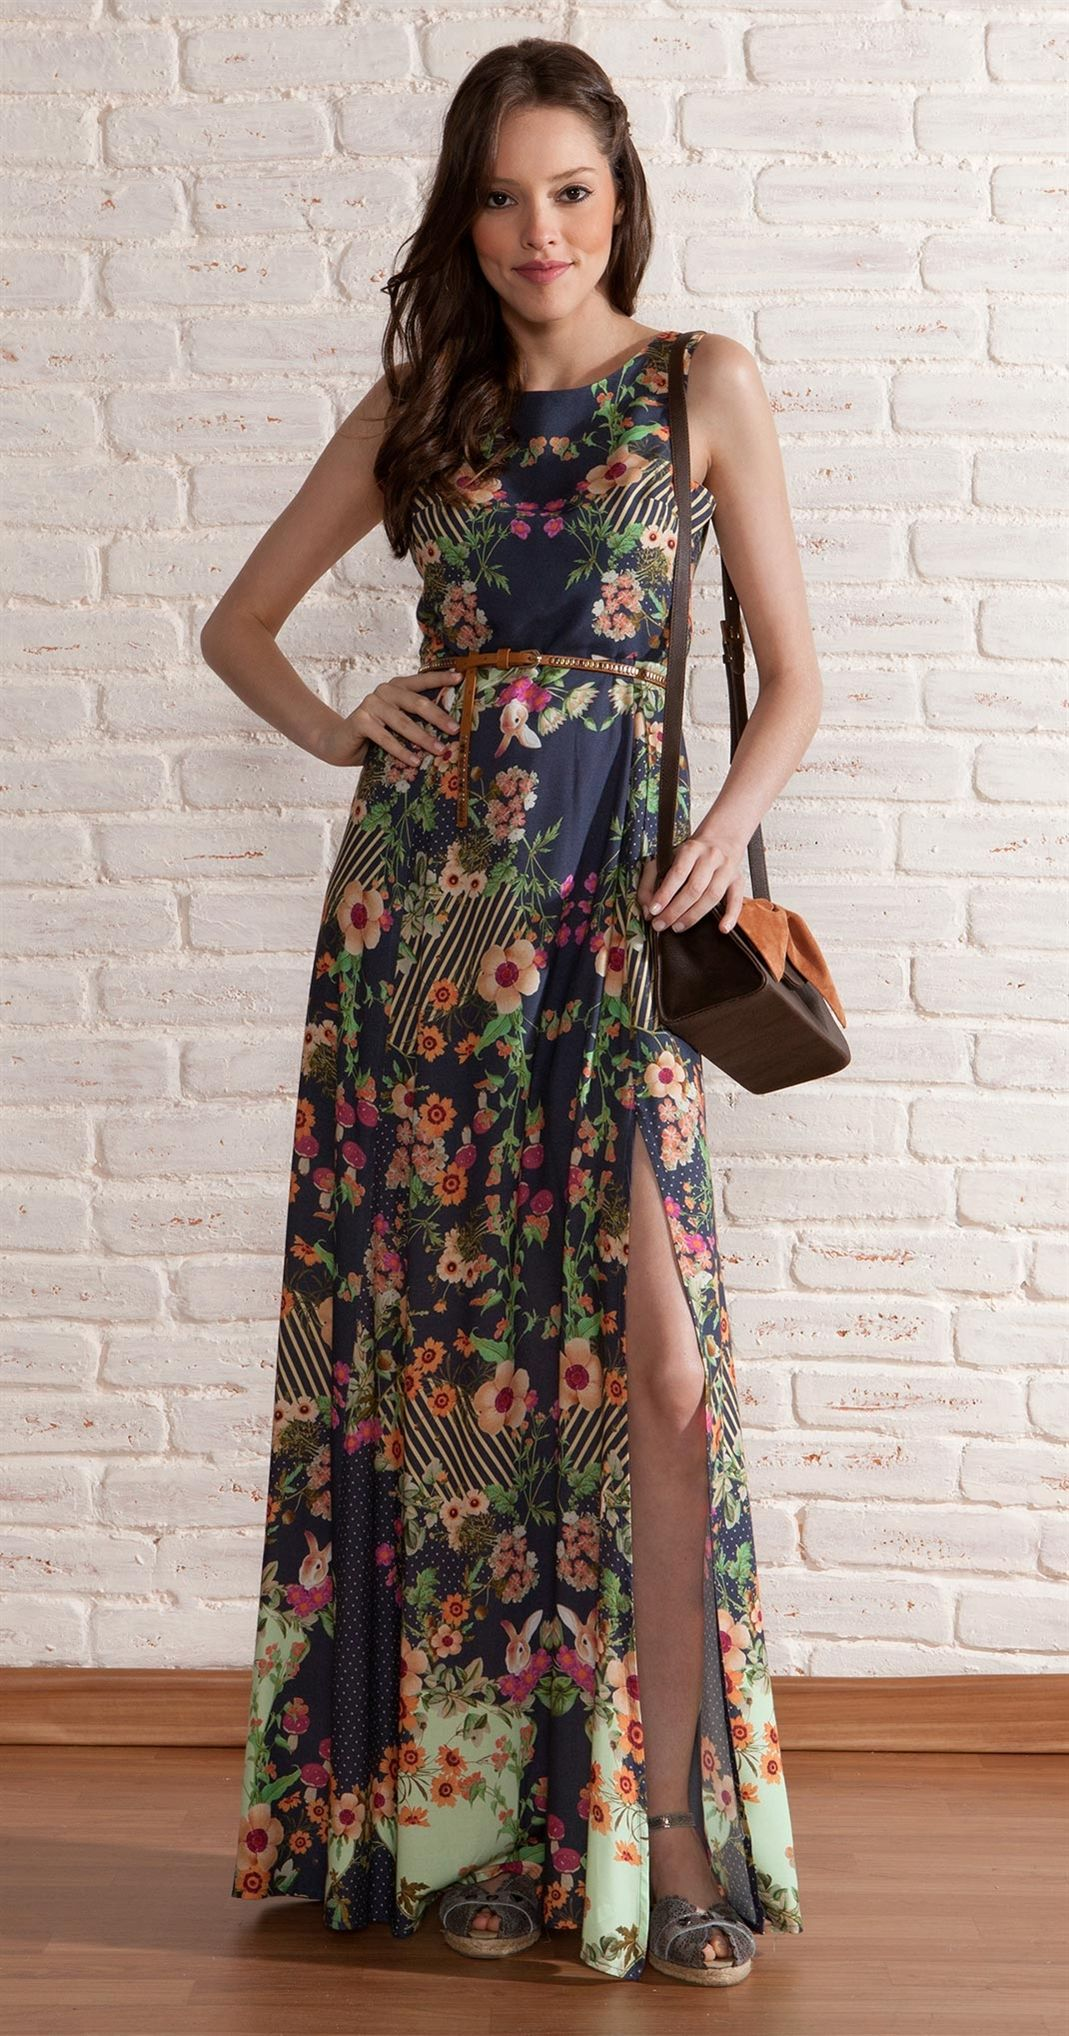 Pin by cleide tofaneli on vestidos pinterest clothes vestidos